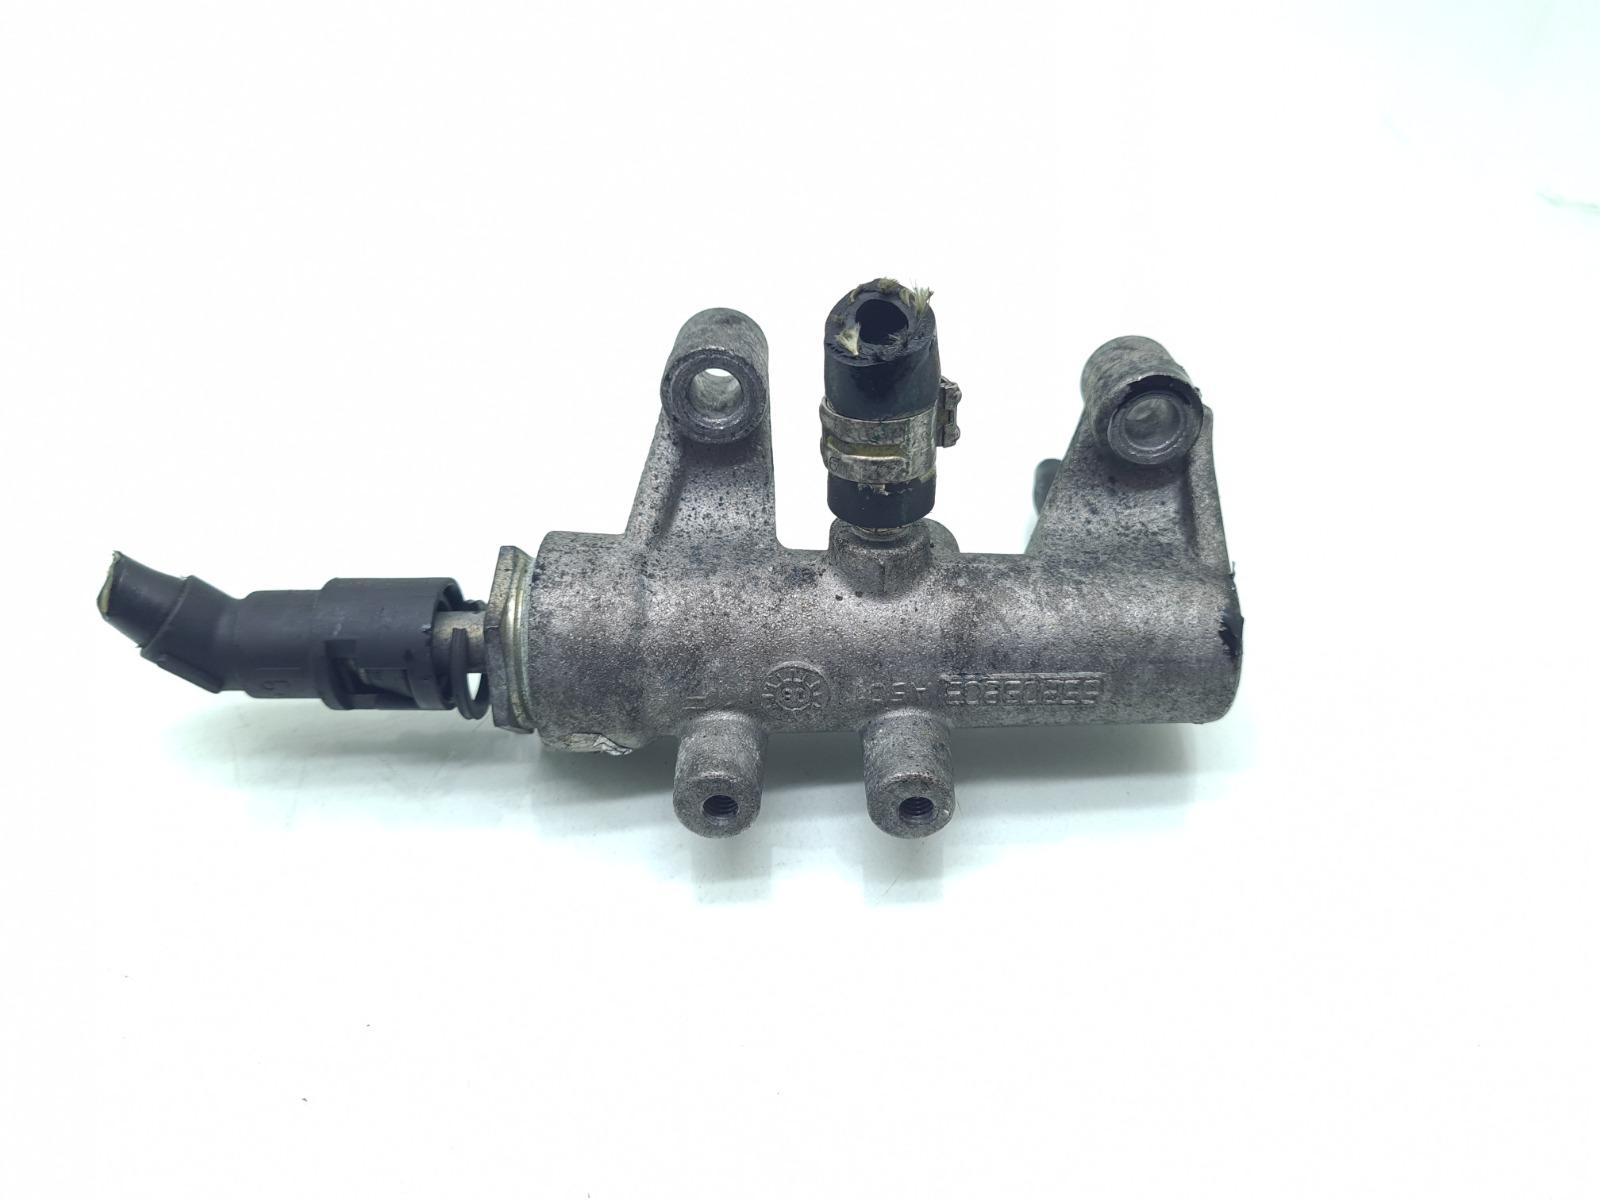 Регулятор давления топлива Opel Astra H 1.9 CDTI 2008 (б/у)